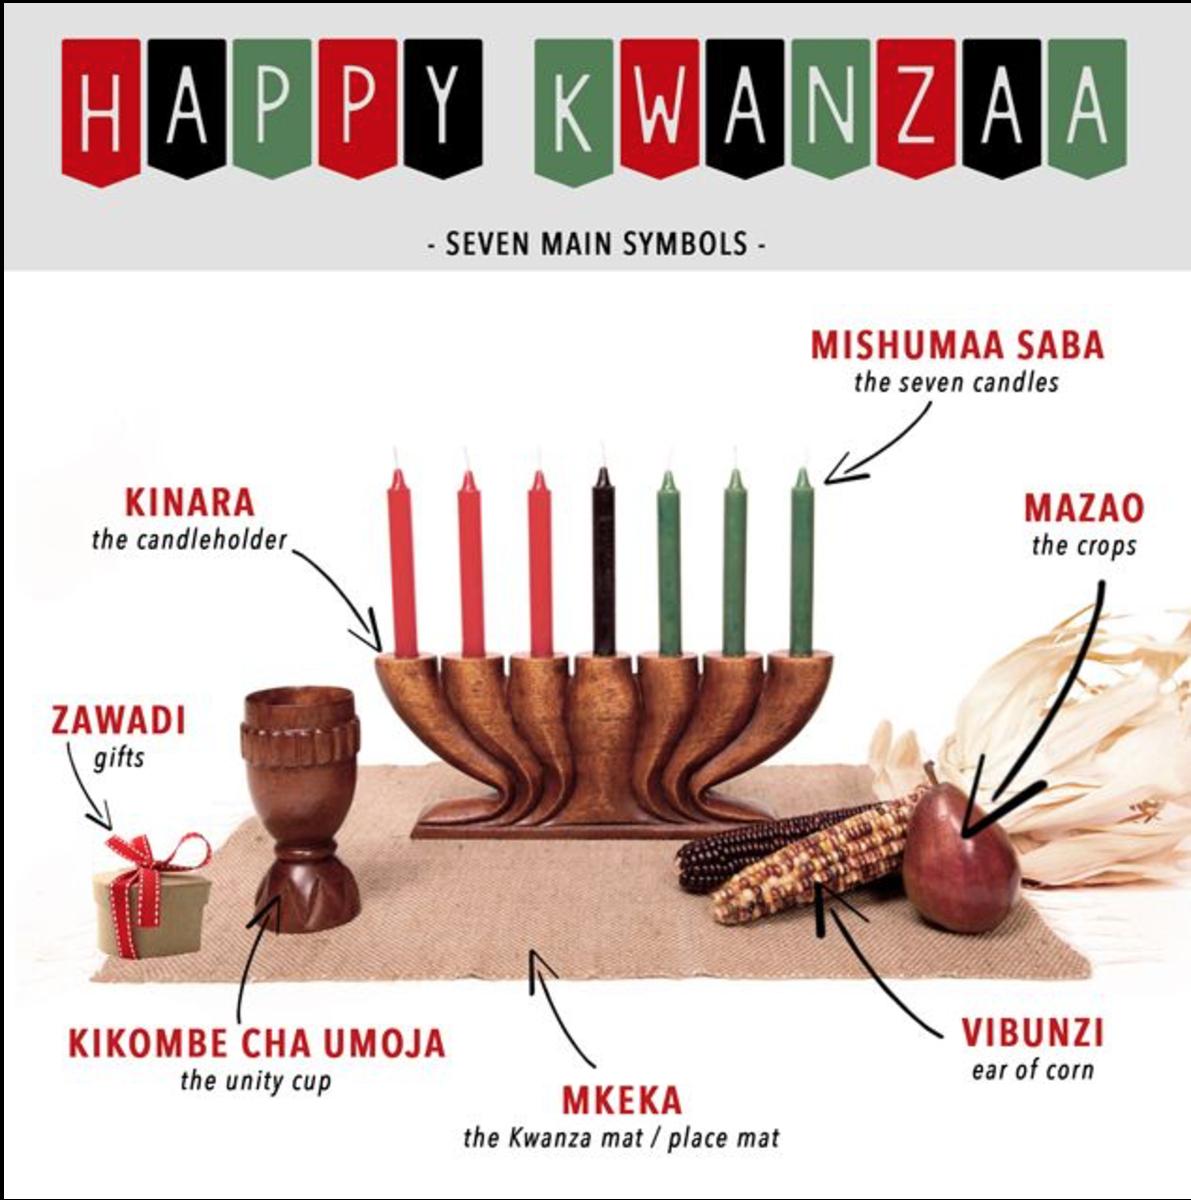 Kwanzaa has seven basic symbols, including the Kinara (Candle Holder).